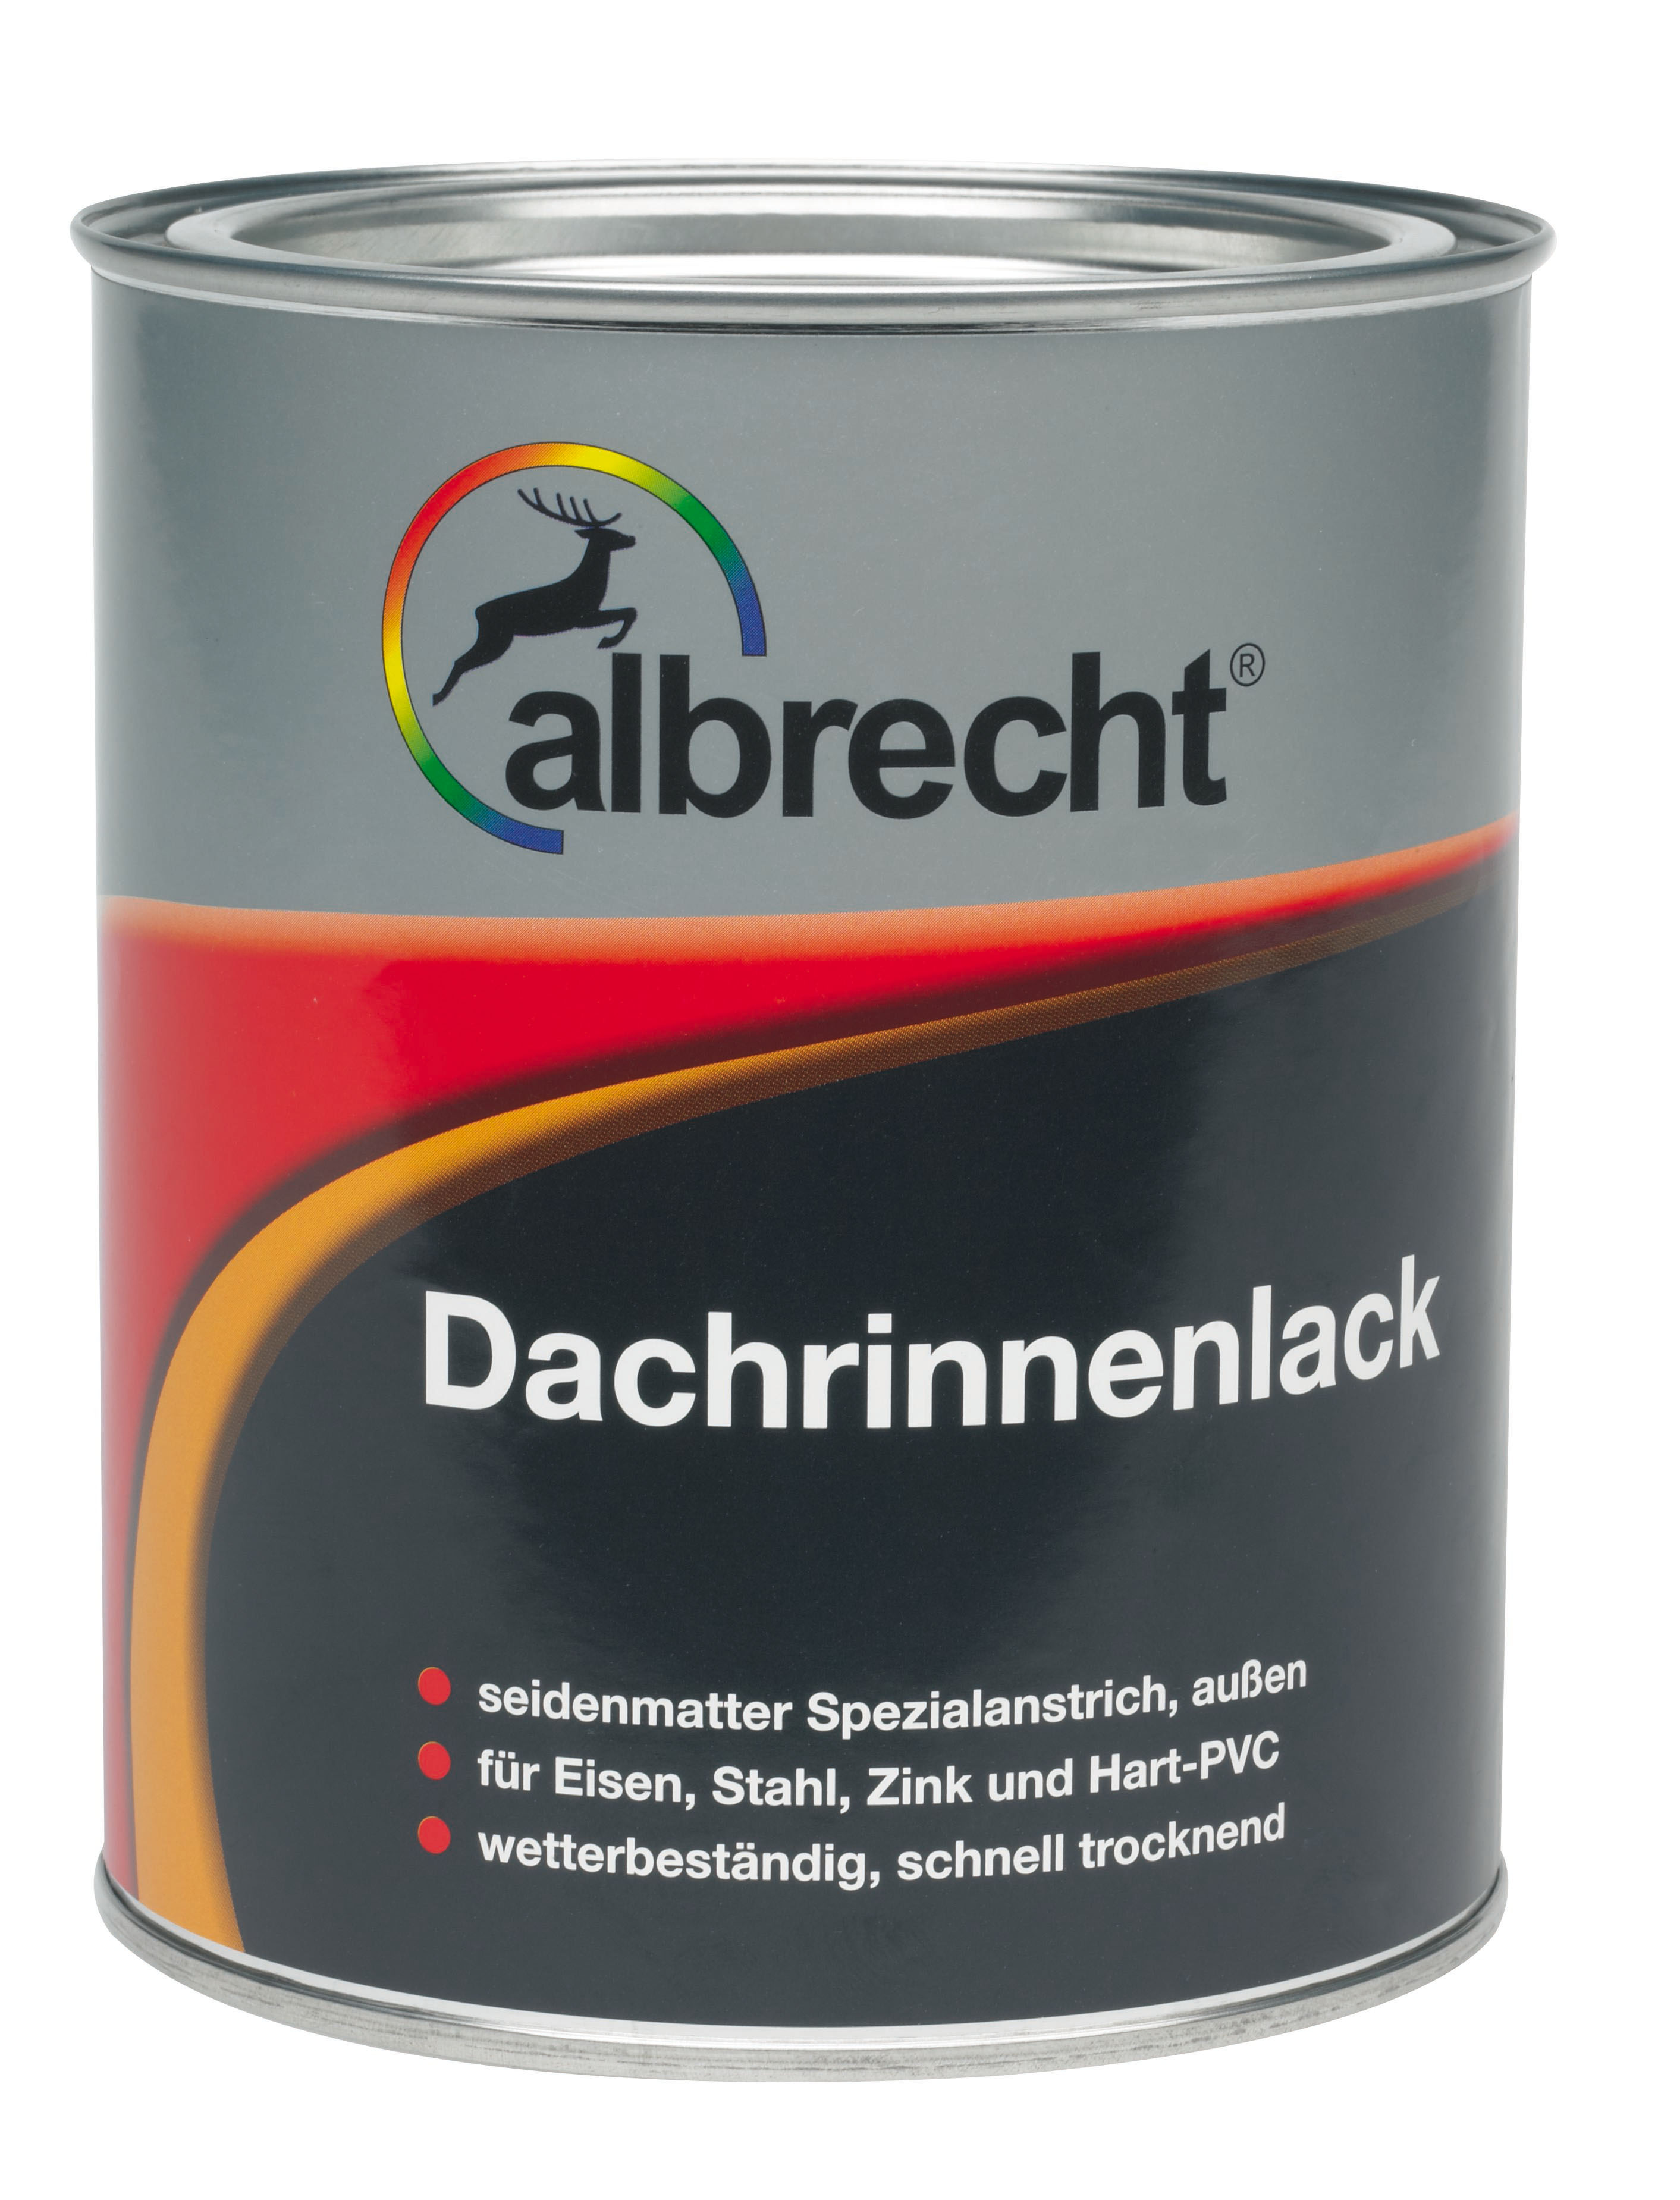 ALB Dachrinnenlack - Braun